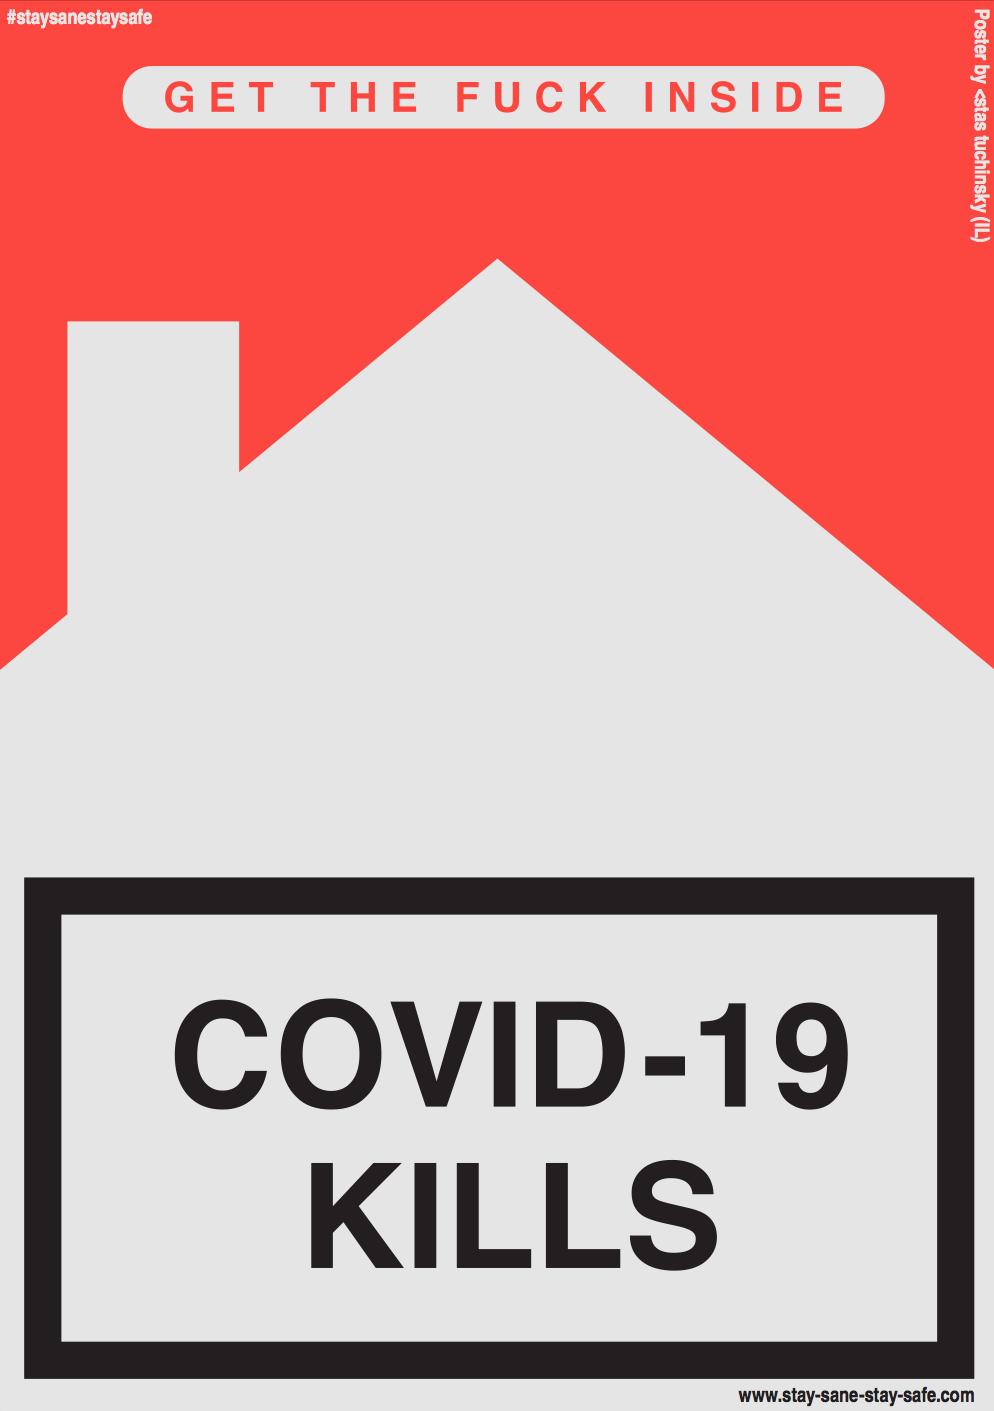 COVID-19 KILLS - stastuchinsky